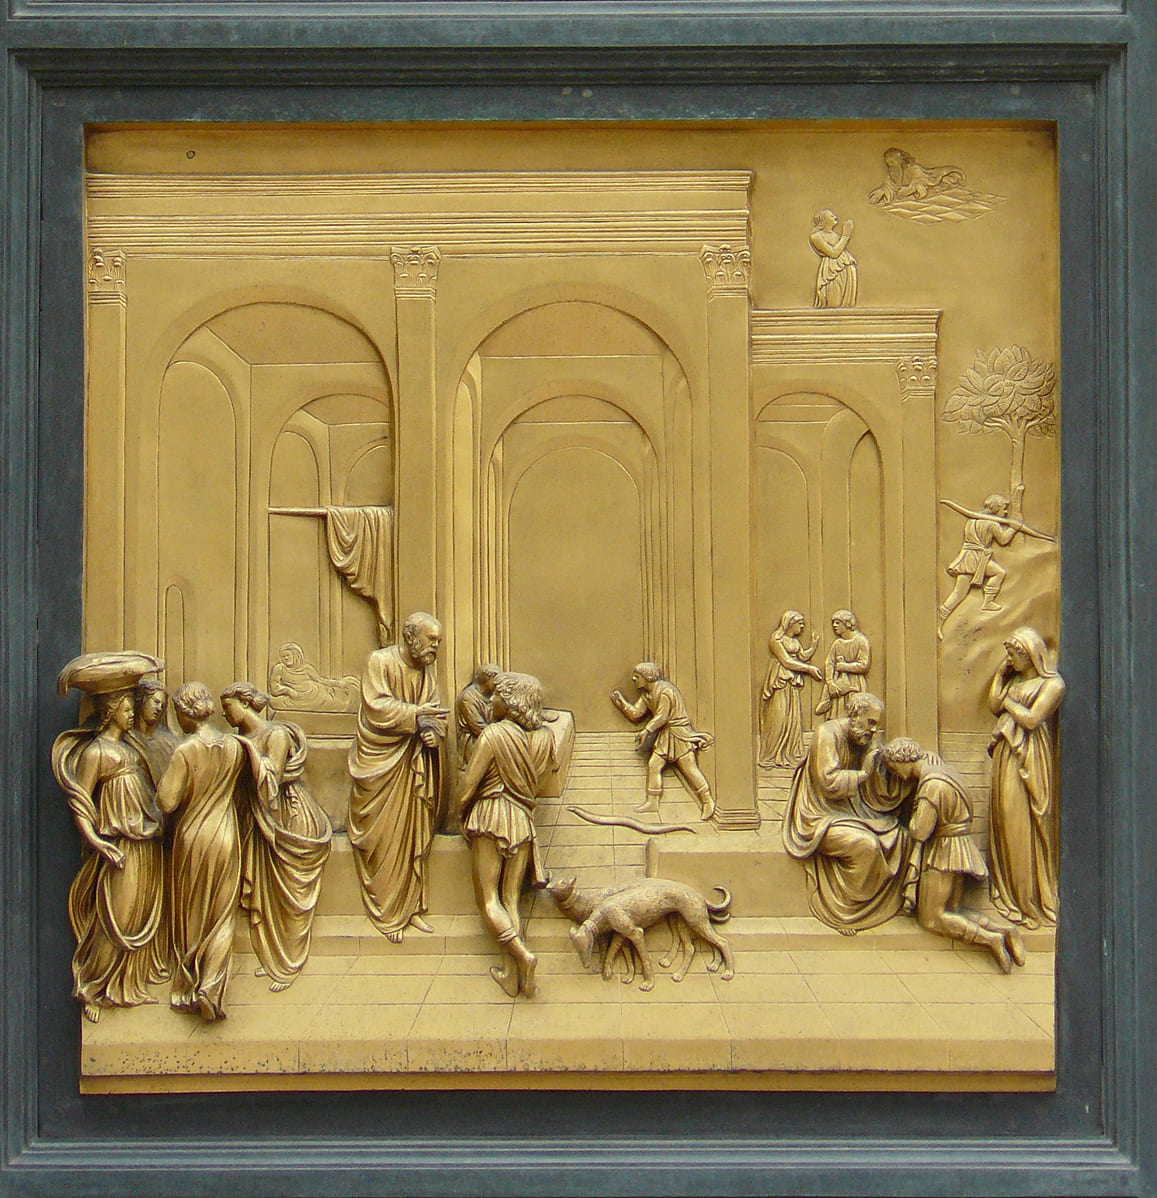 jacob esau attente chien scene de vie marché Ghiberti